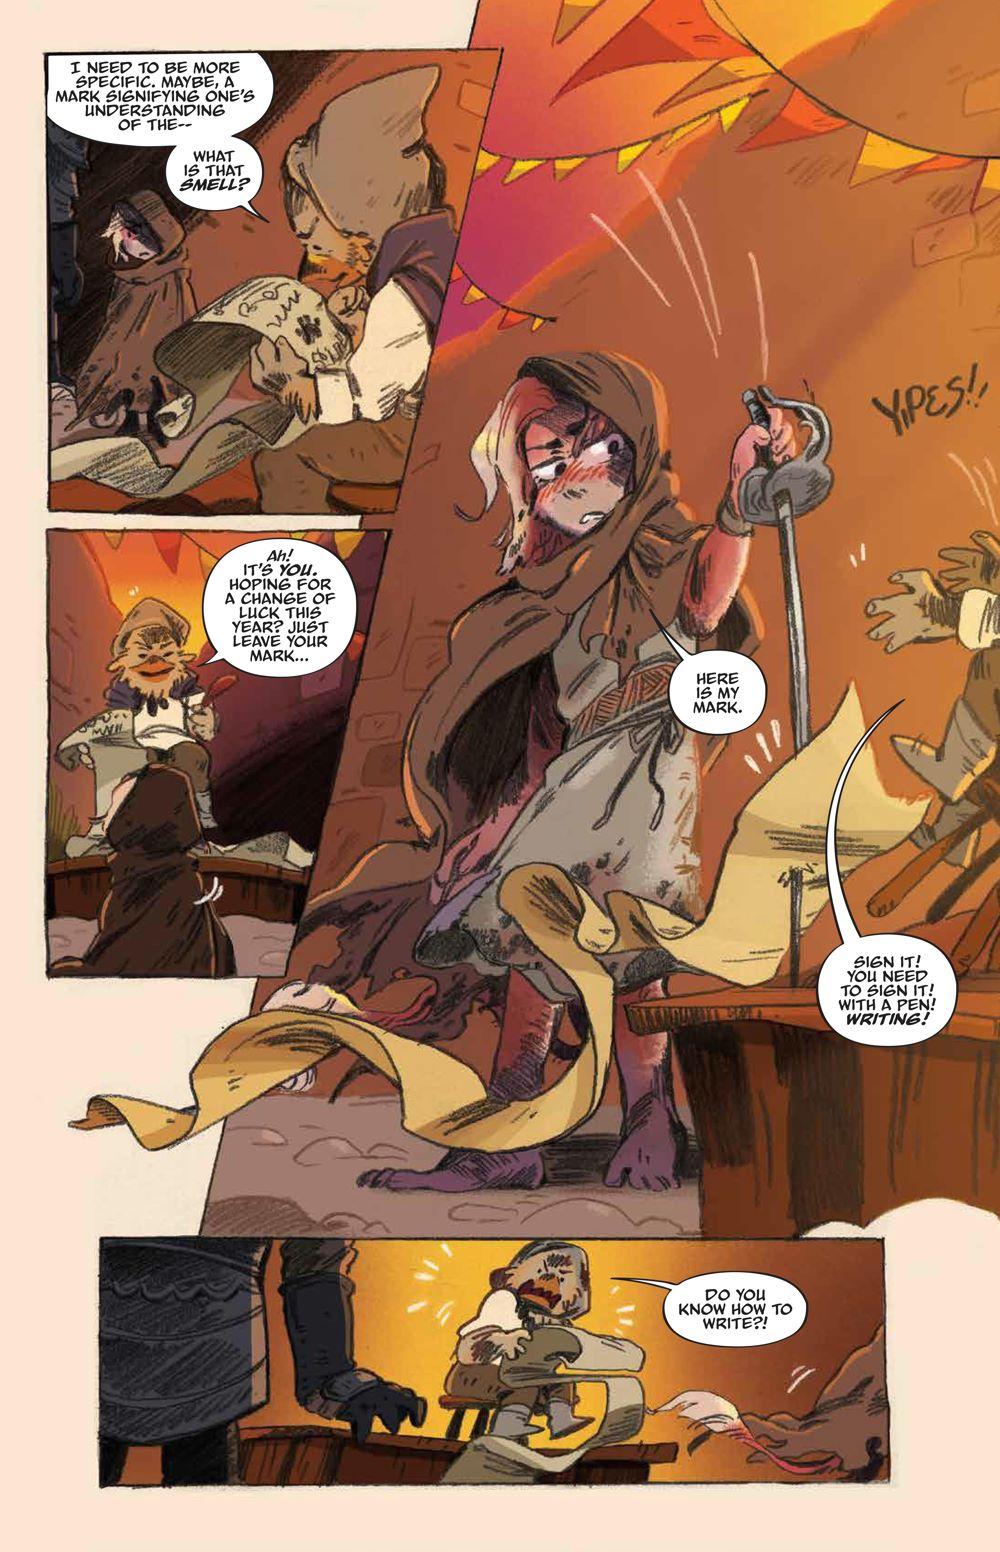 Labyrinth_UnderSpell_HC_PRESS_13 ComicList Previews: JIM HENSON'S LABYRINTH UNDER THE SPELL HC